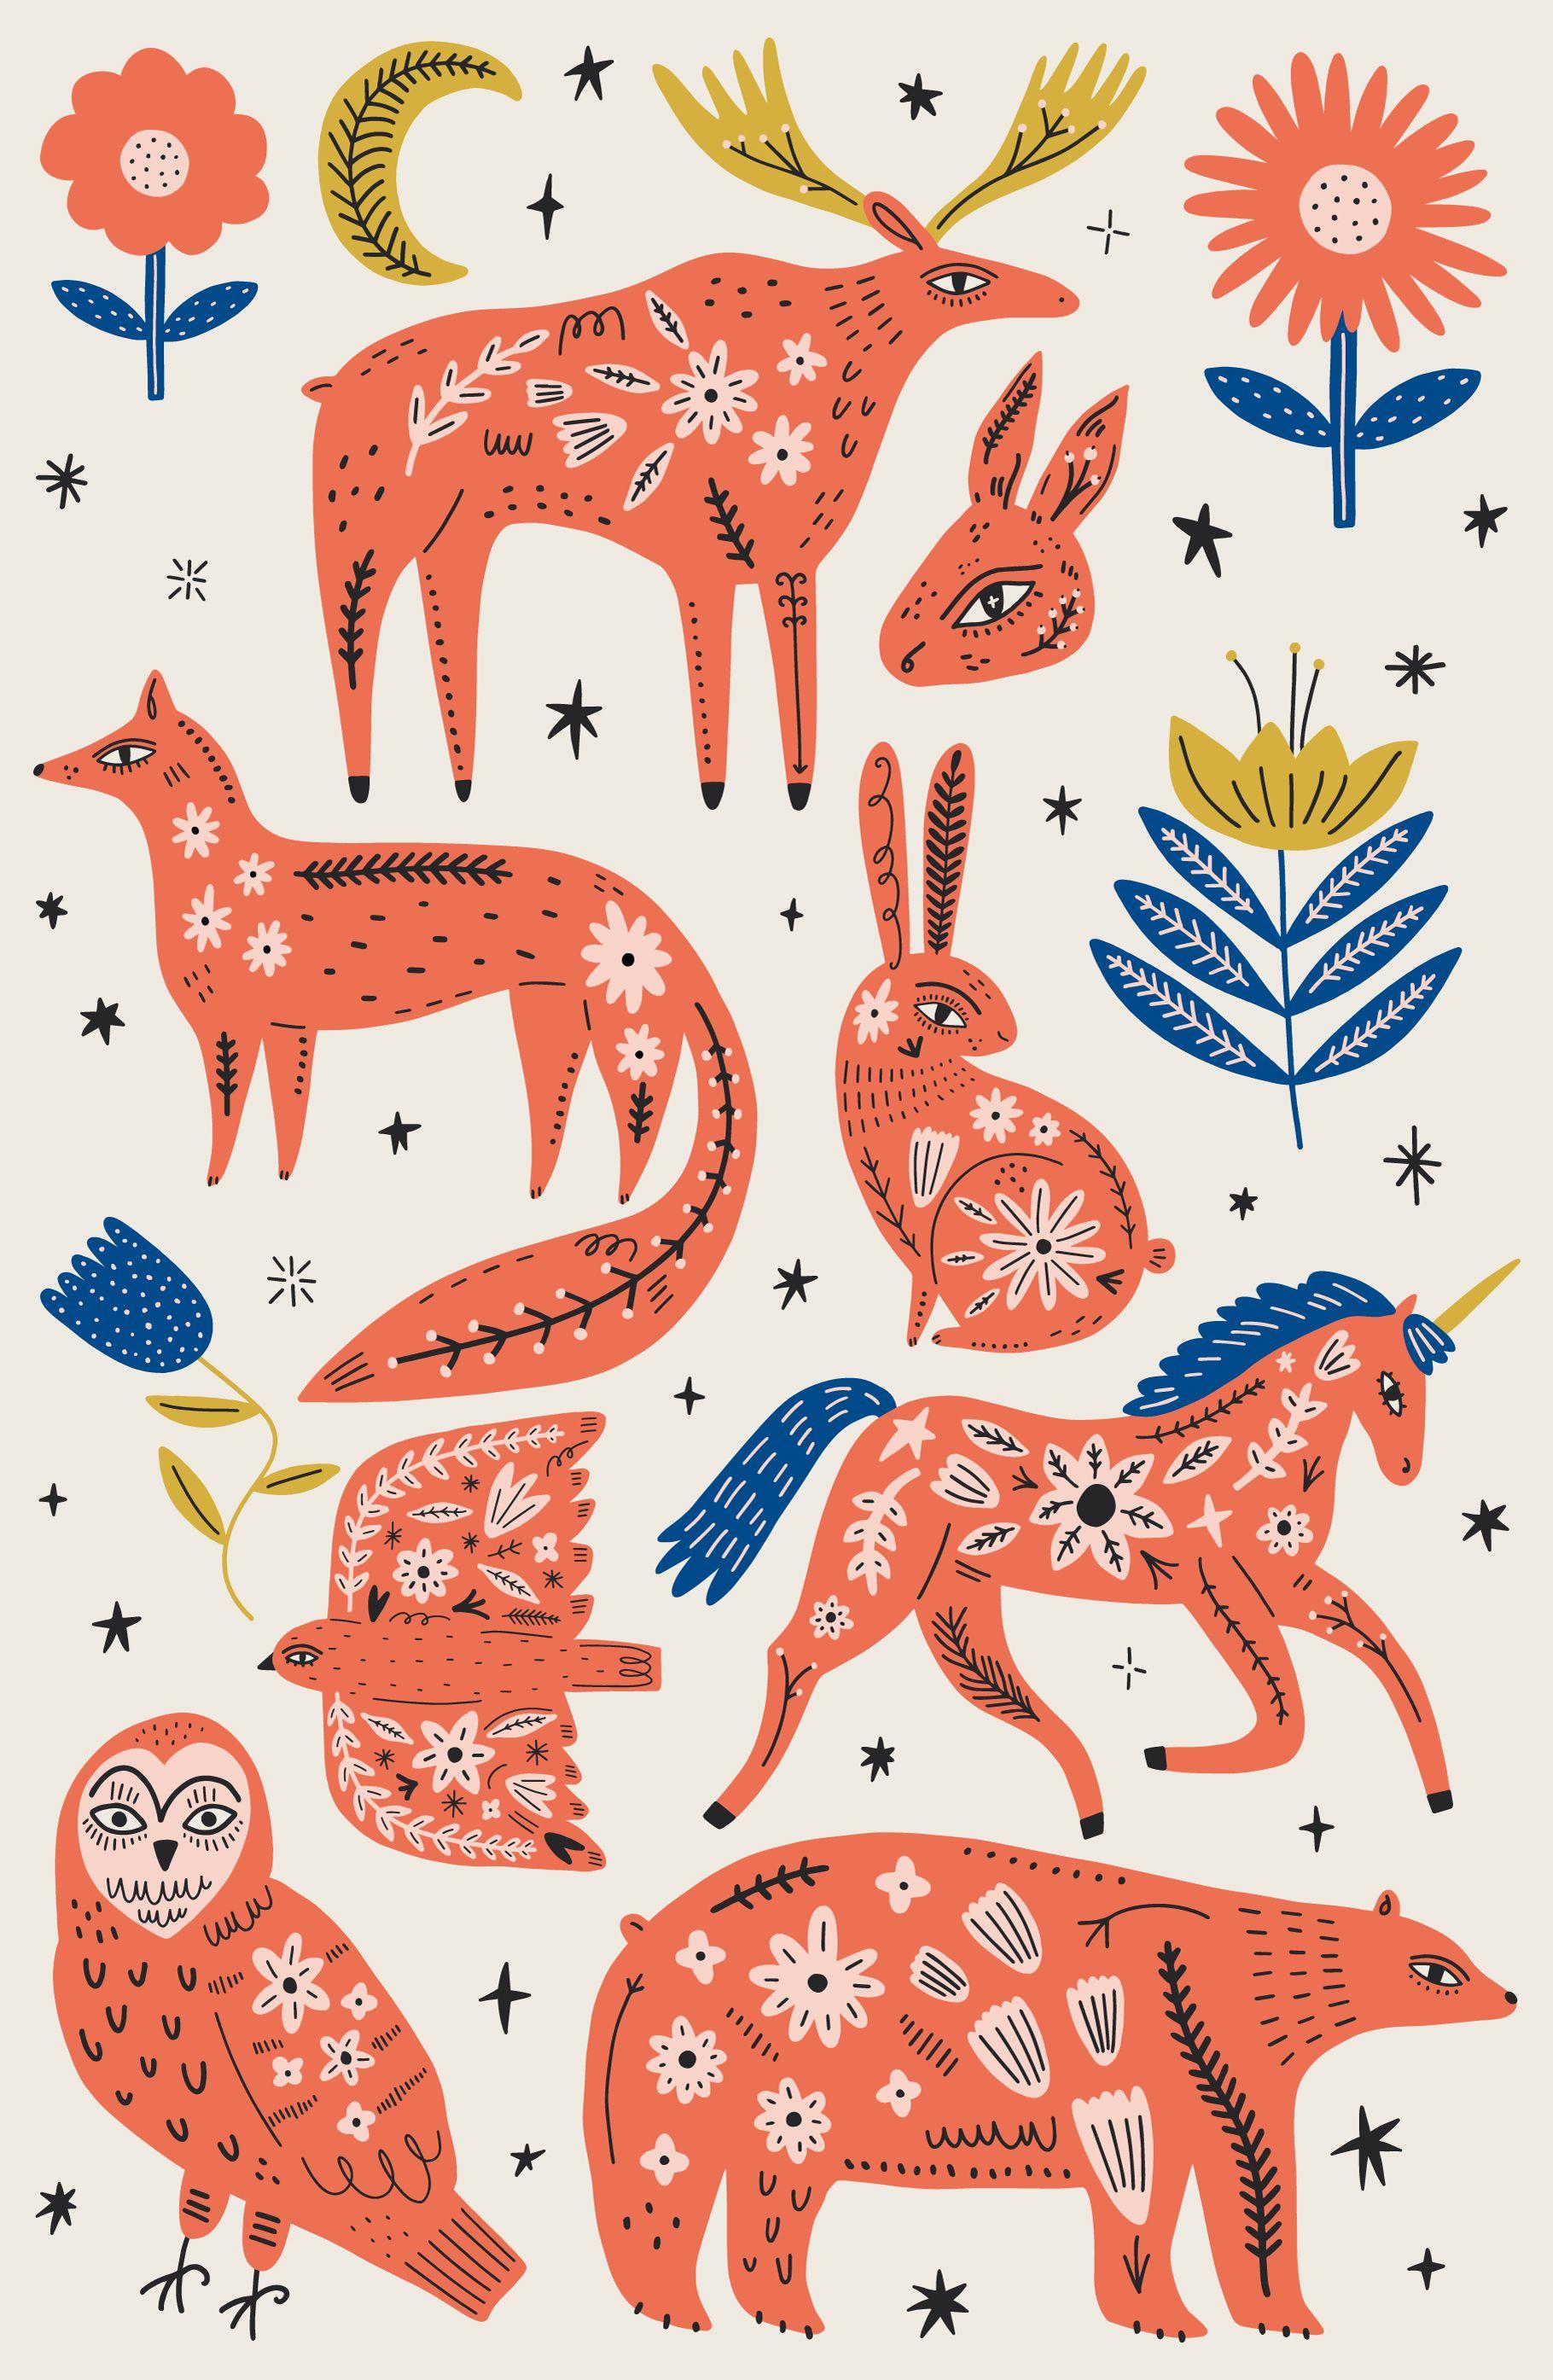 Scandinavian Ornate Animals Bundle In 2020 Modern Folk Art Scandinavian Folk Art Scandinavian Art